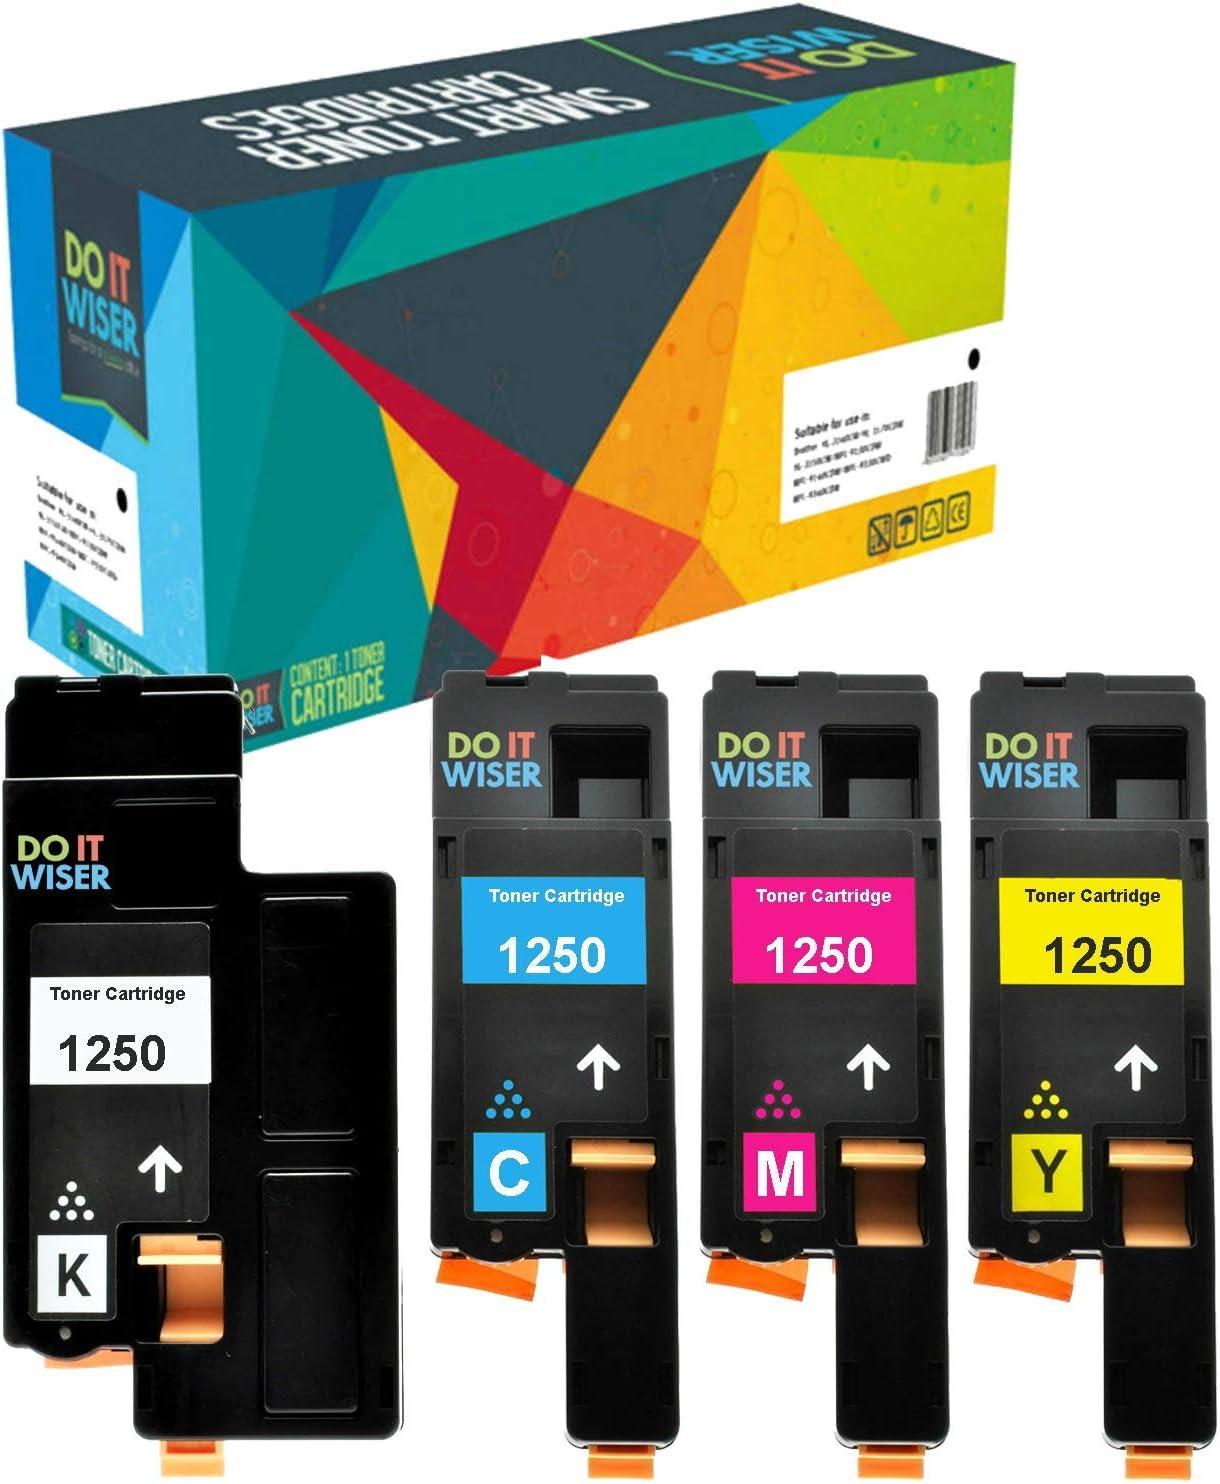 Do it Wiser Compatible Toner Cartridge Replacement for Dell C1760nw C1765nfw 1250c 1350cnw 1355cn 1355cnw C1765nf - 810WH Black, C5GC3 Cyan, XMX5D Magenta, WM2JC Yellow (4-Pack)